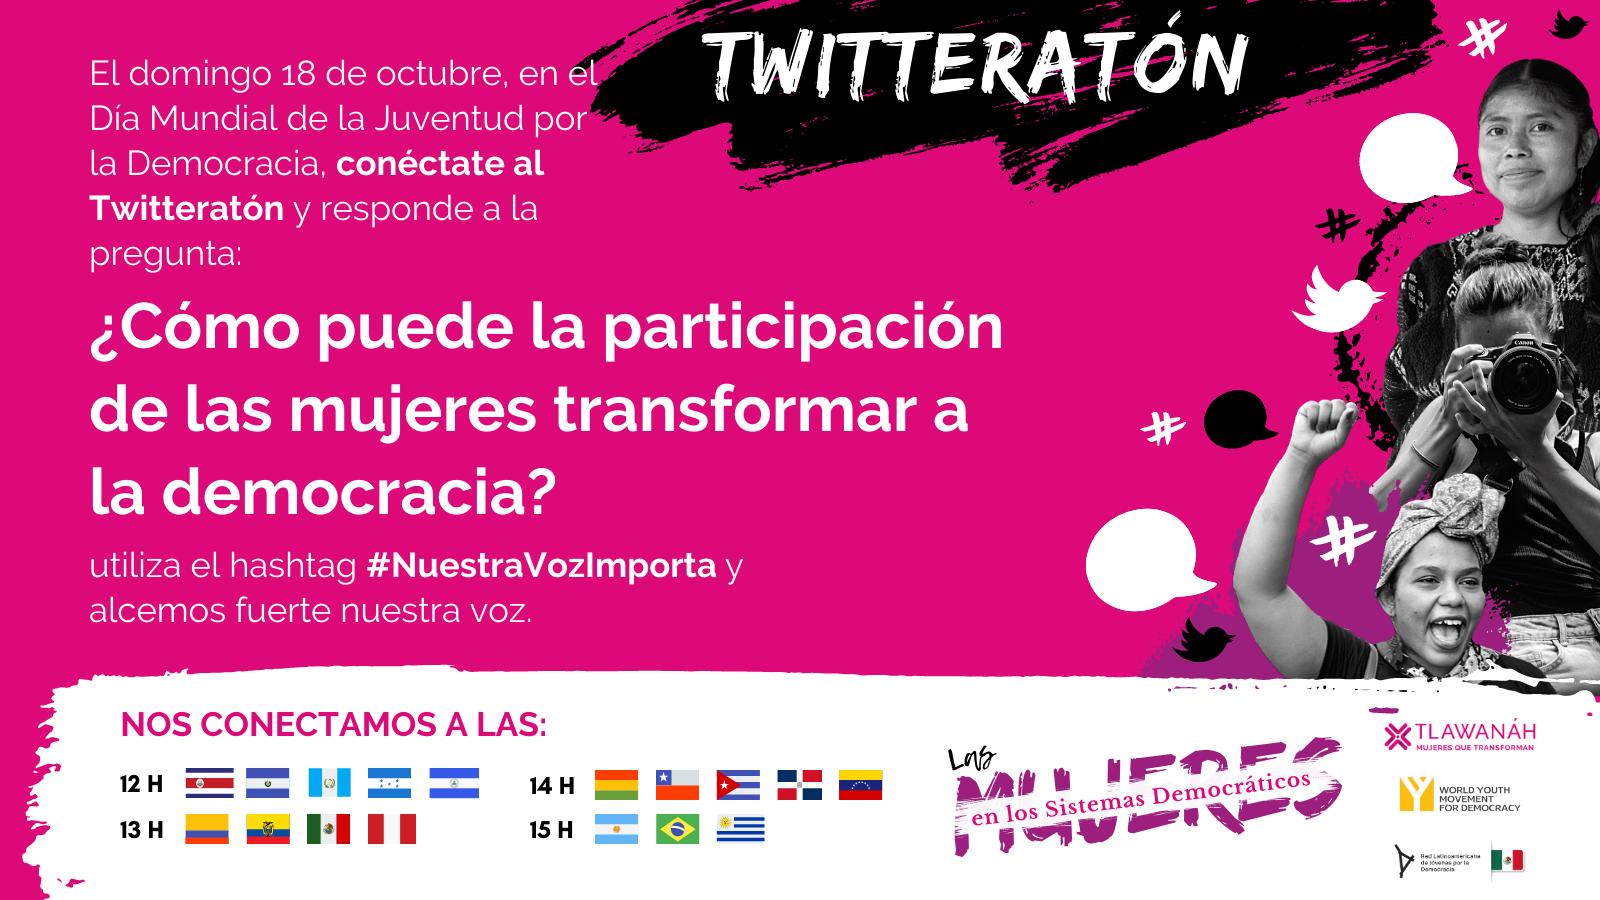 Tw Twitteratón #NuestraVozImporta